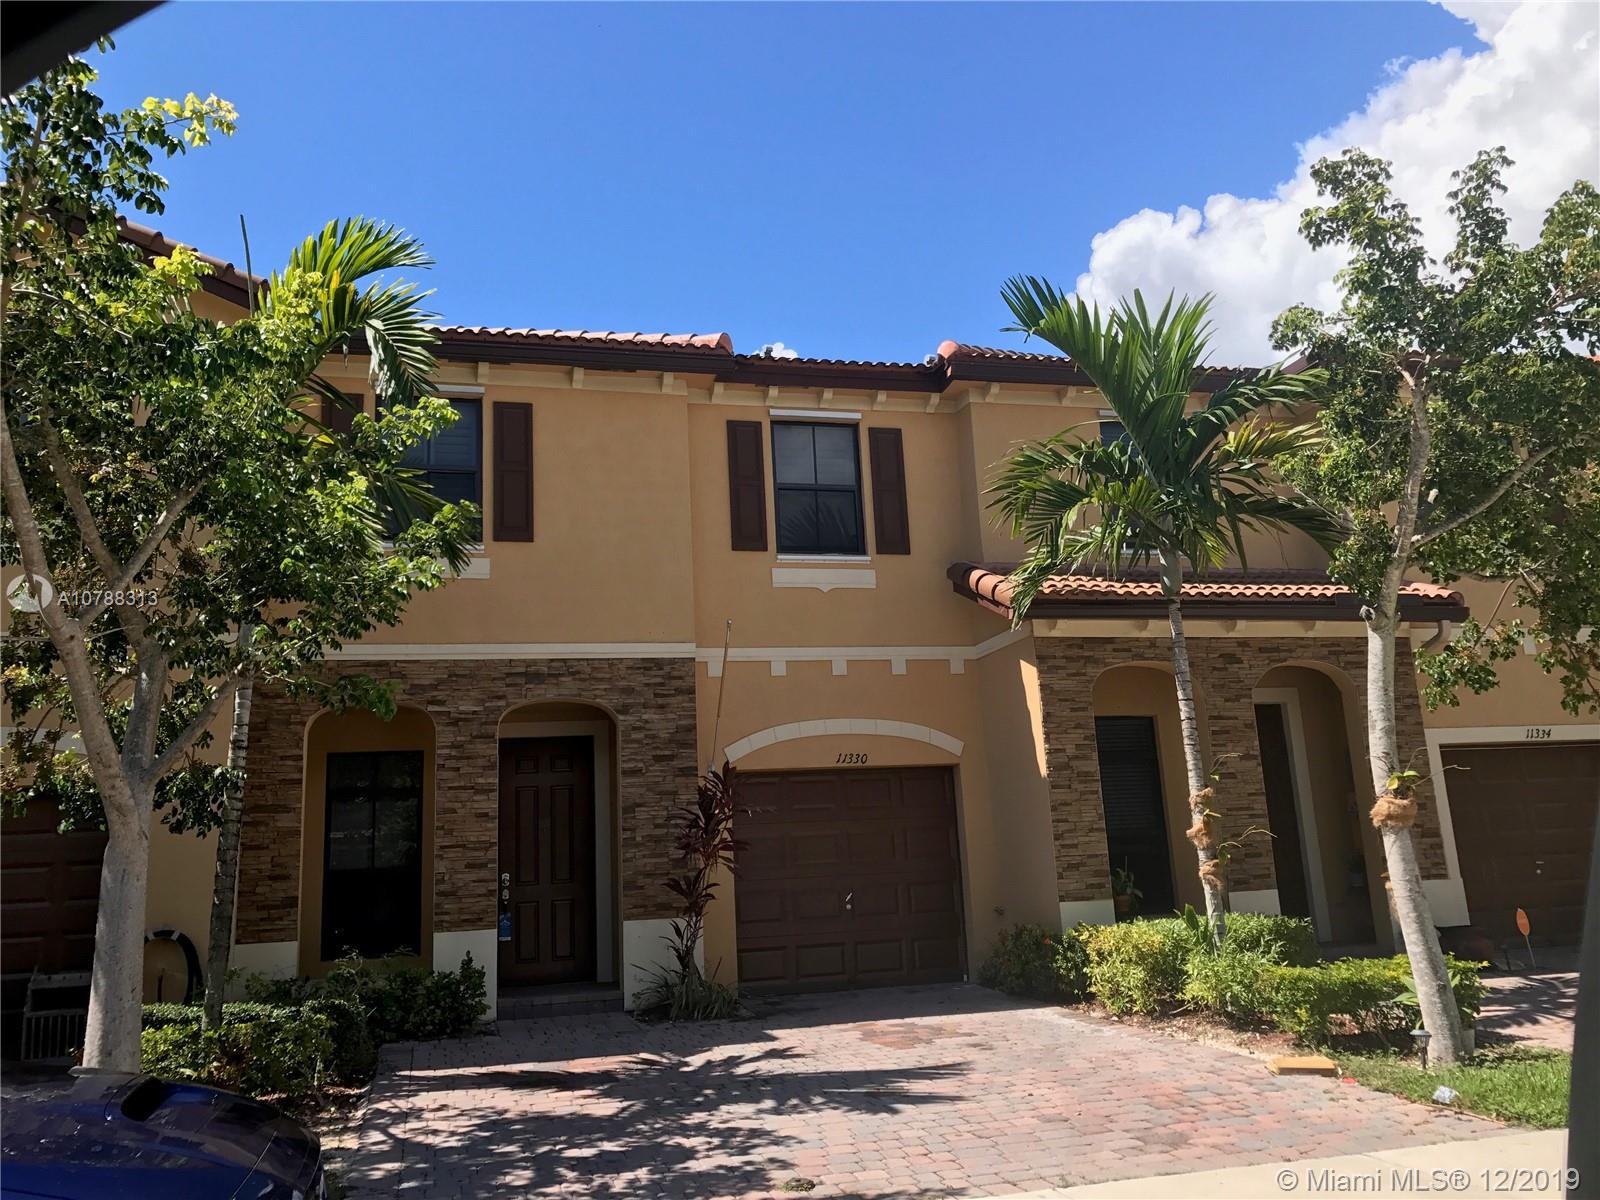 11330 SW 232nd Ter #11330, Homestead, FL 33032 - Homestead, FL real estate listing